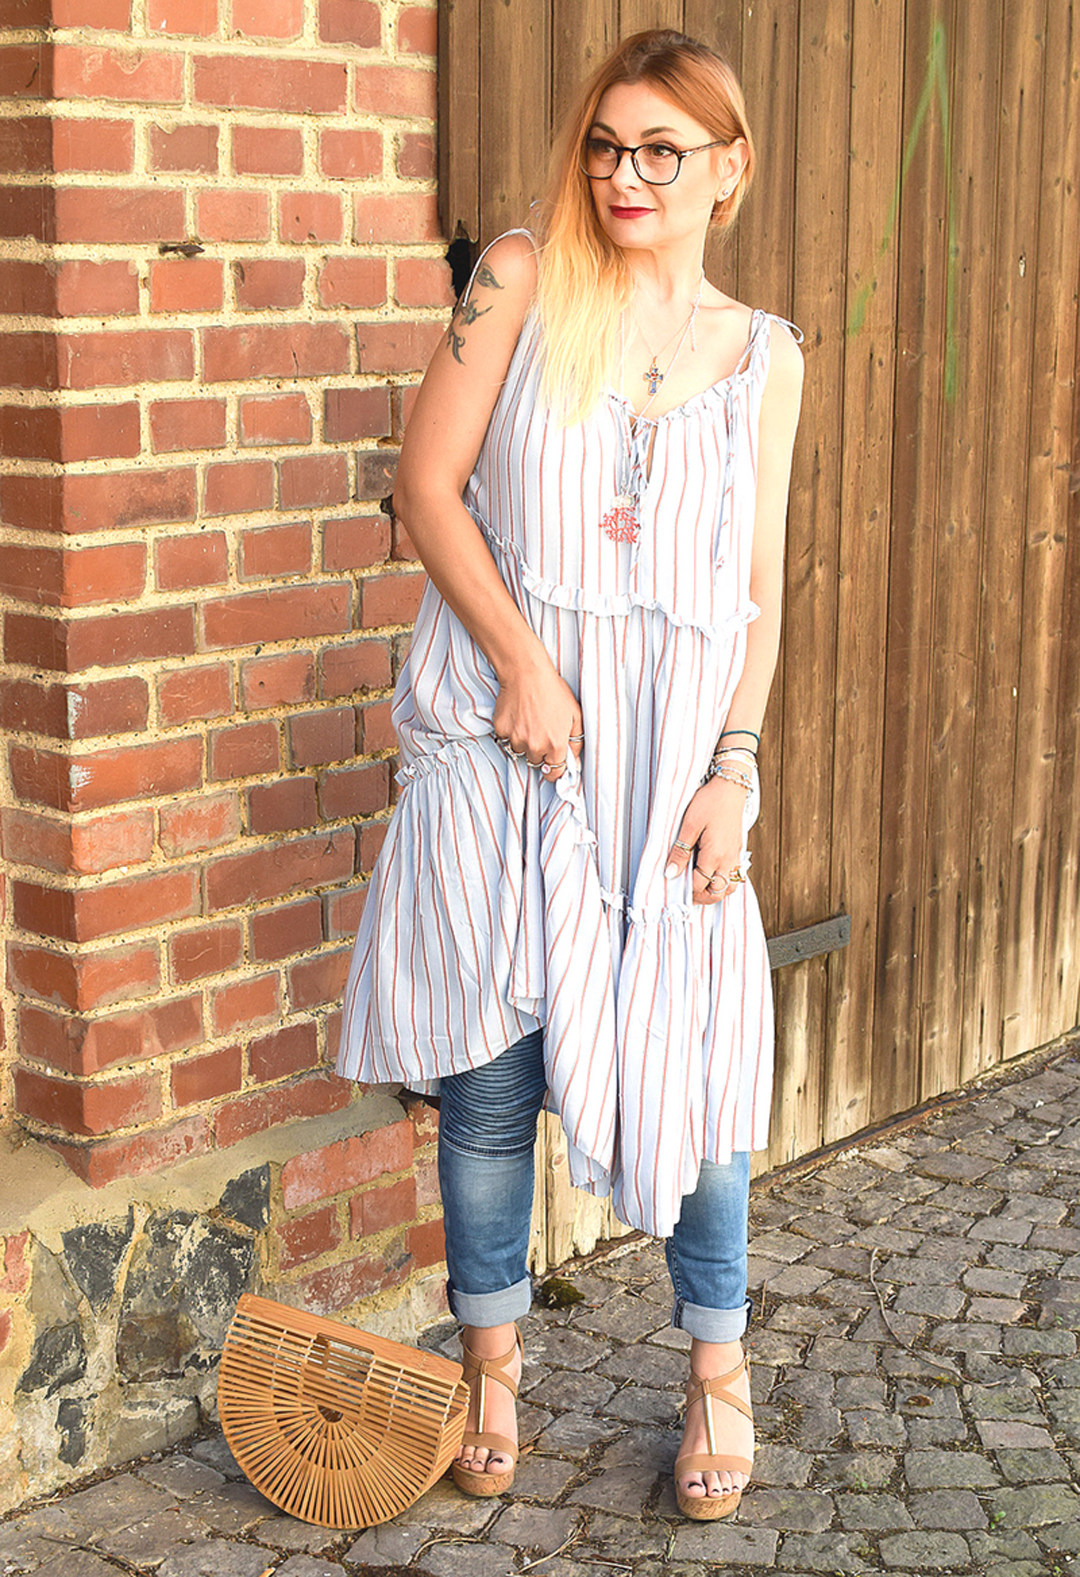 Kleid über Hose, Sommerlook